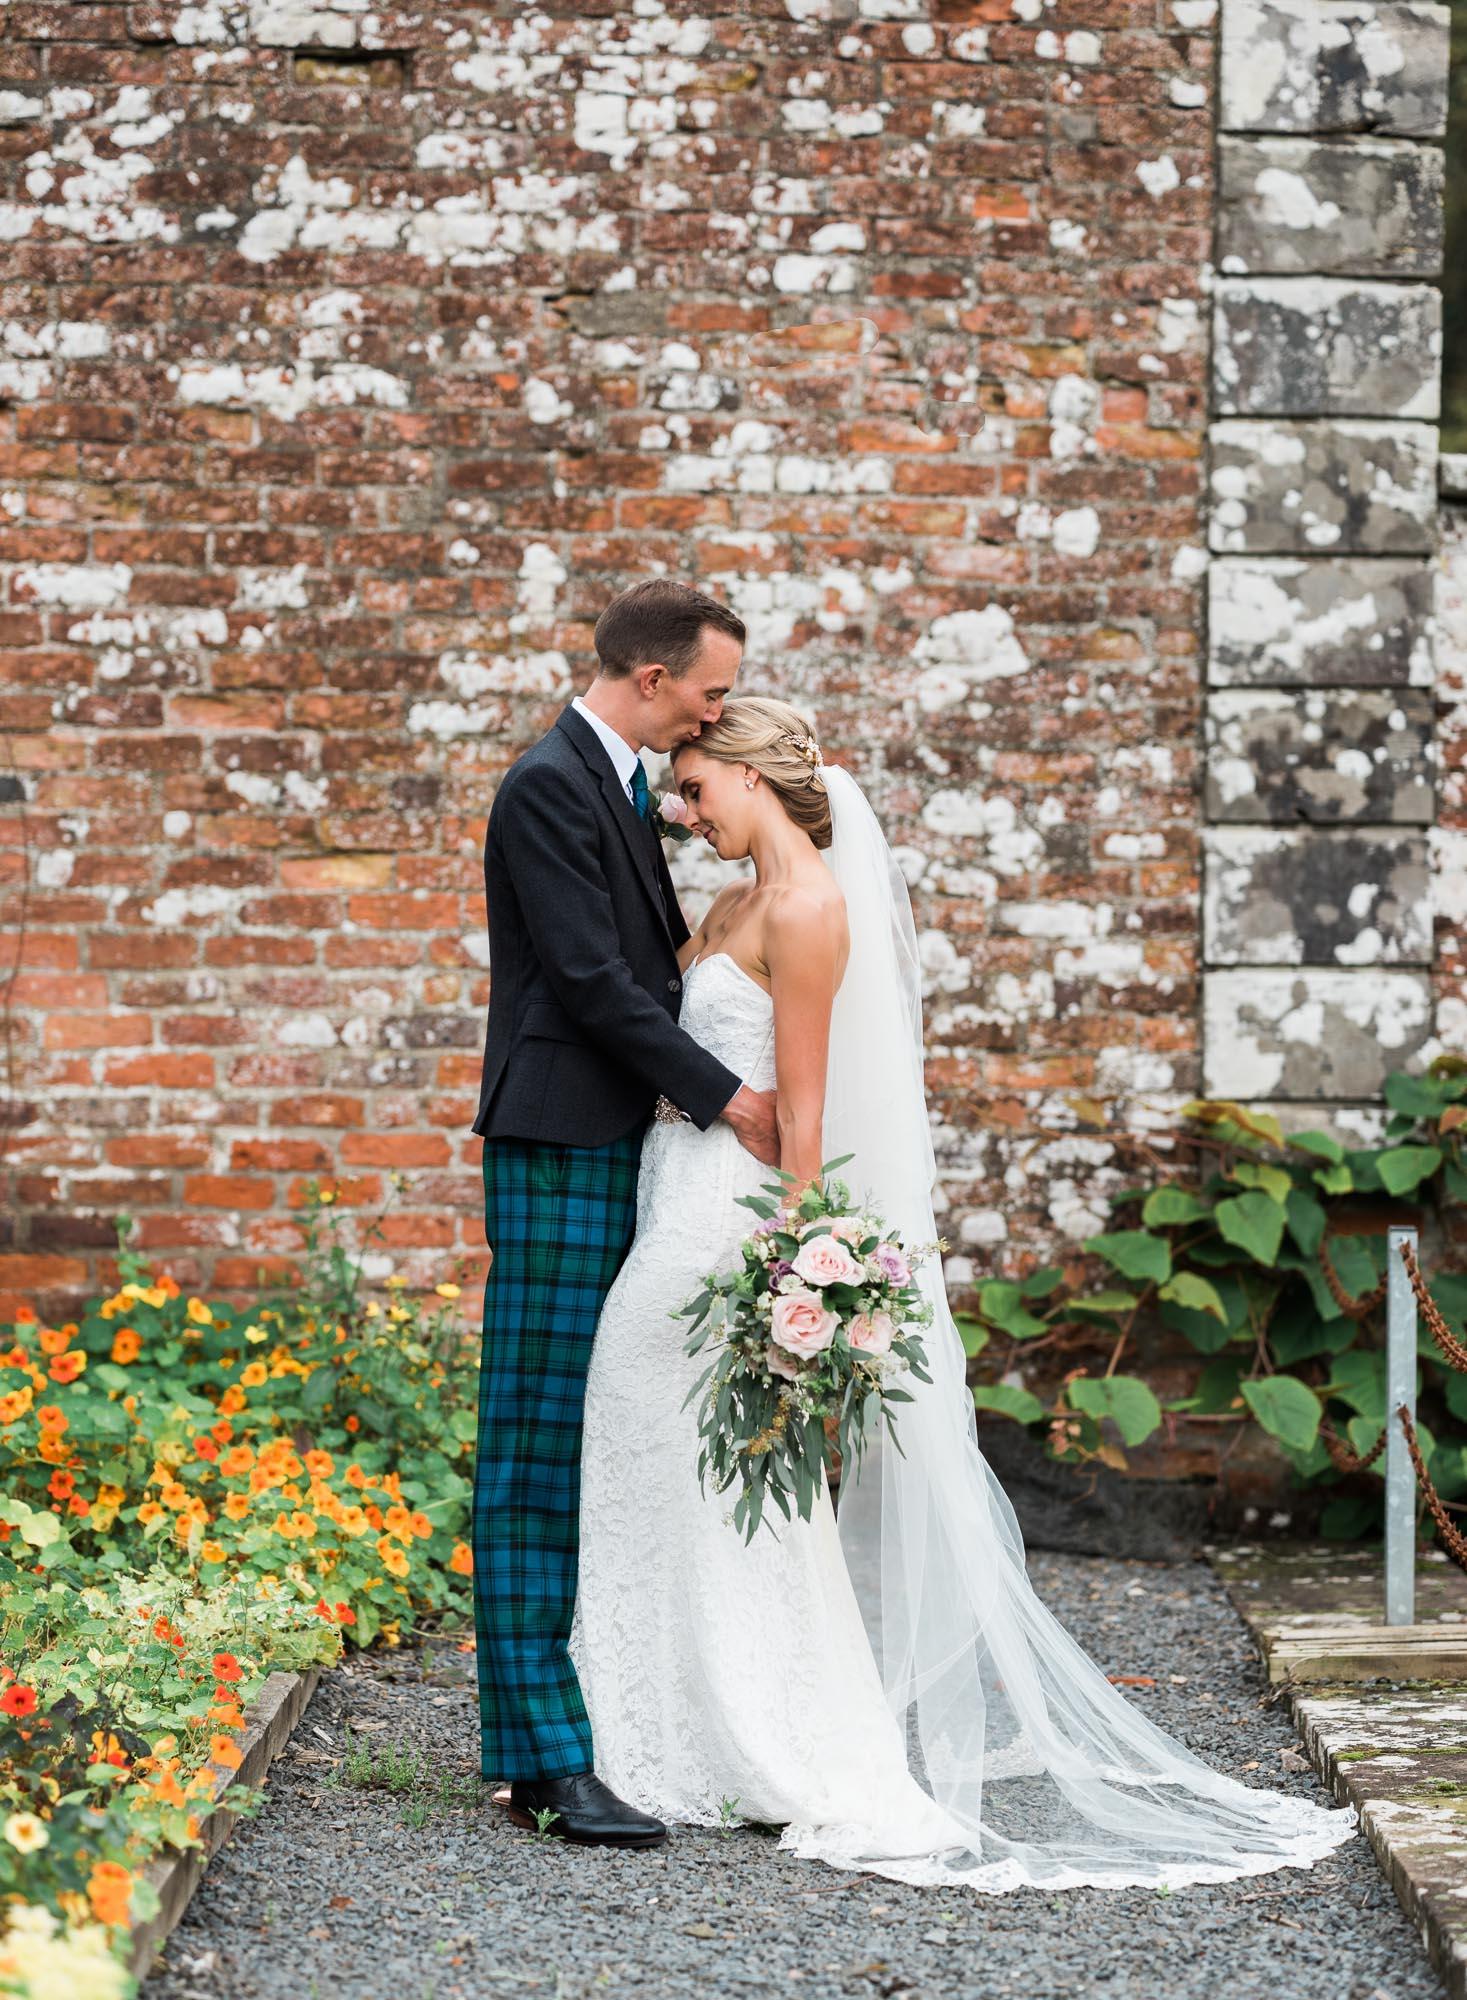 scottish_wedding_blairquhan_castle-48.jpg